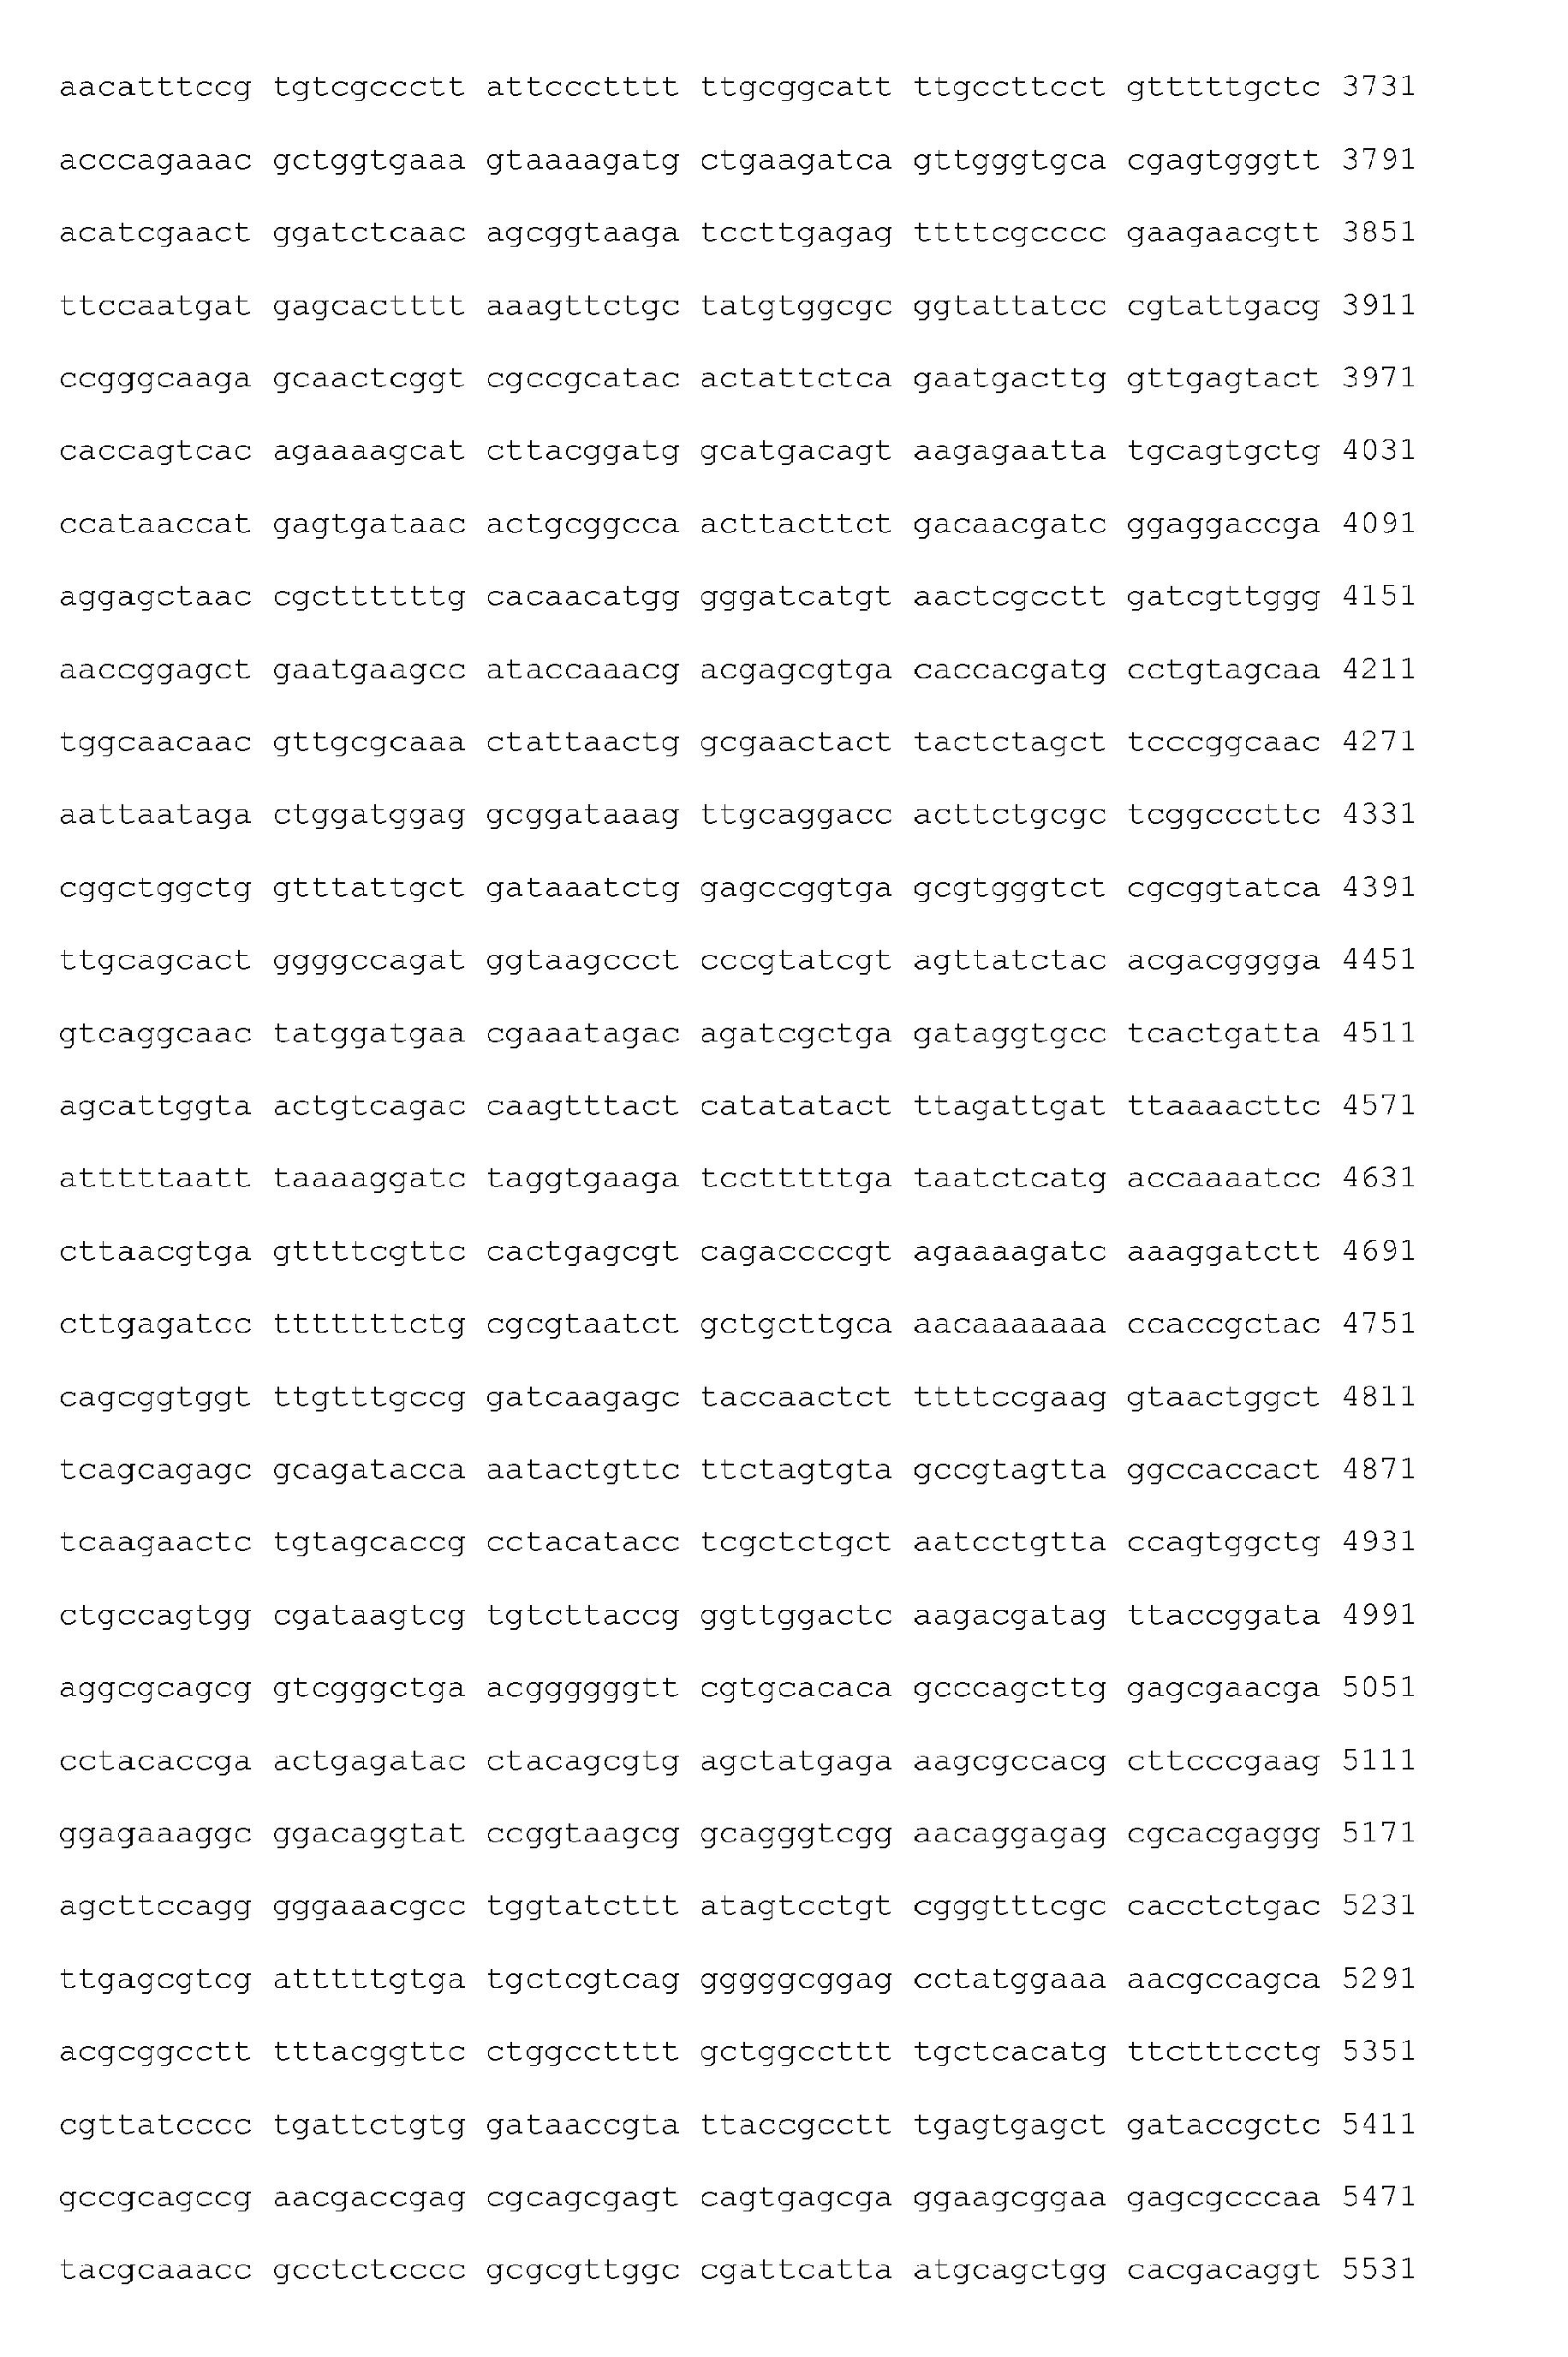 Nextion Proportional Fonts